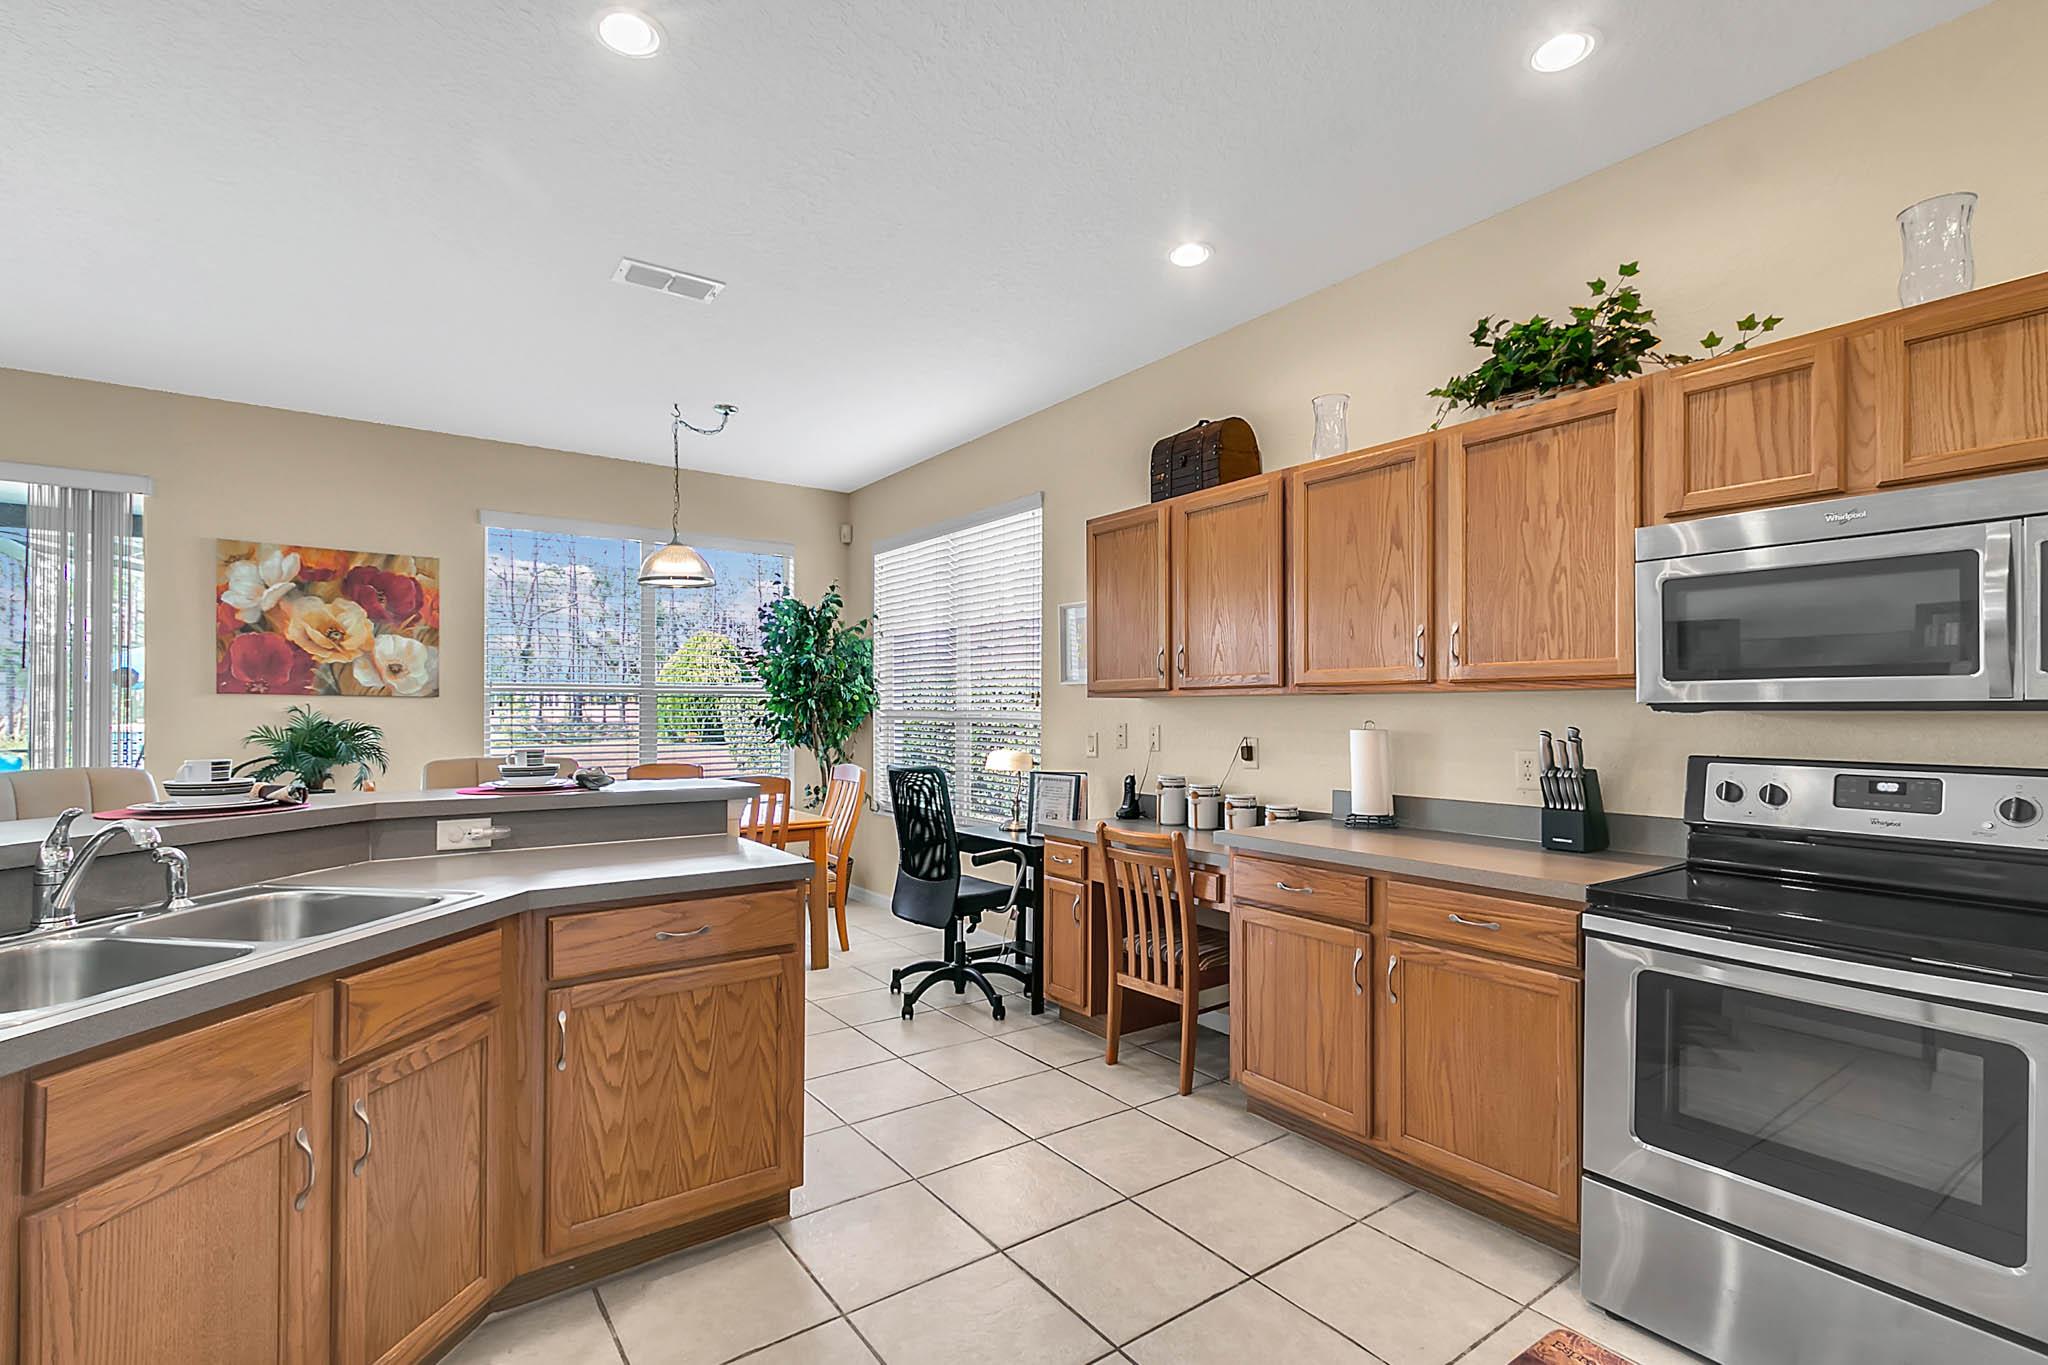 229-N-Hampton-Dr--Davenport--FL-33897----13---Kitchen.jpg